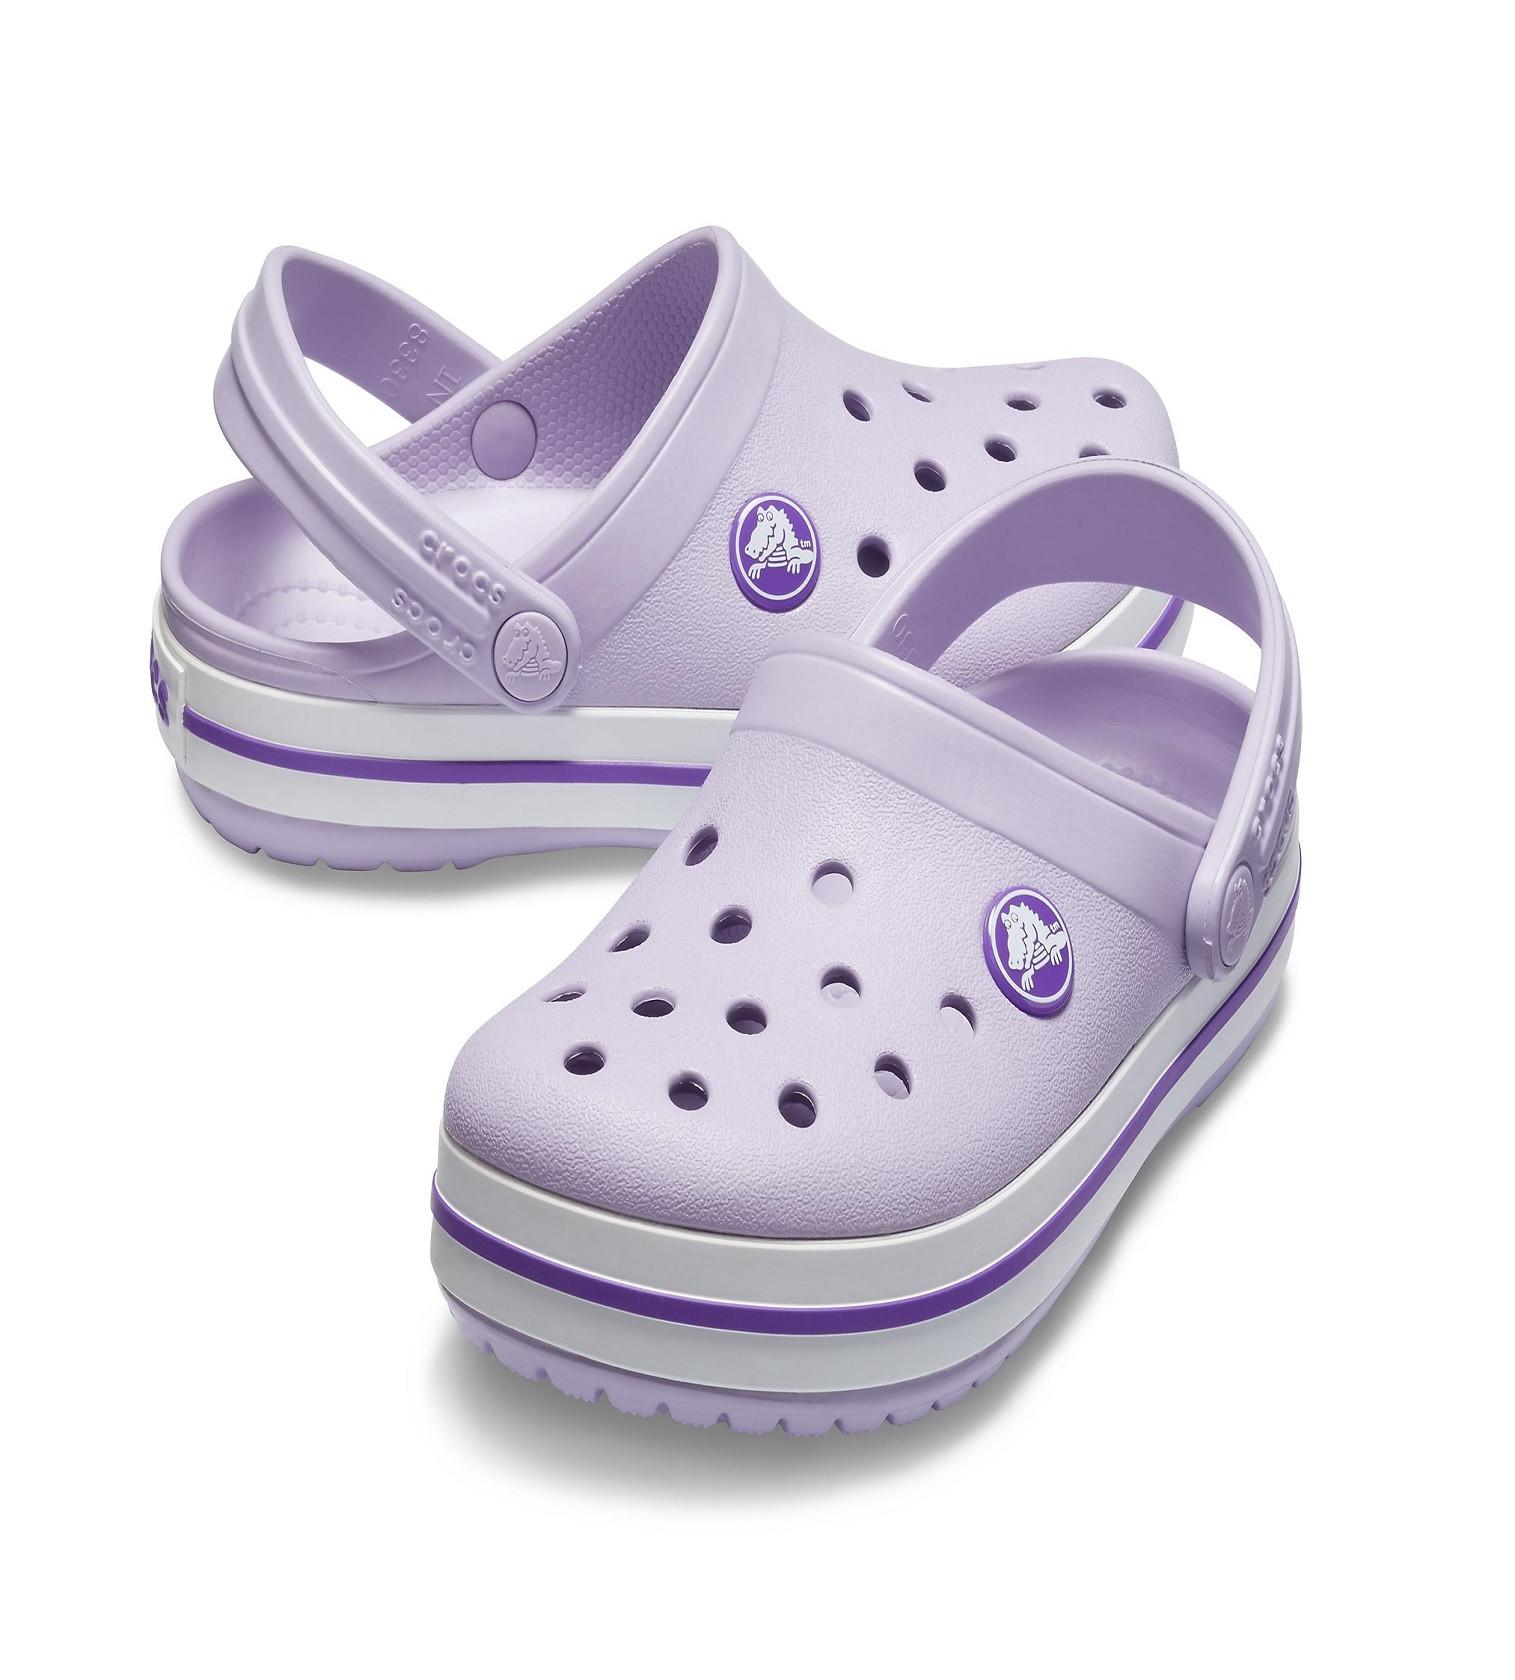 Купити Дитячі сабо CROCS Crocband ™ clog: Lavender / Neon Purple - фото 1